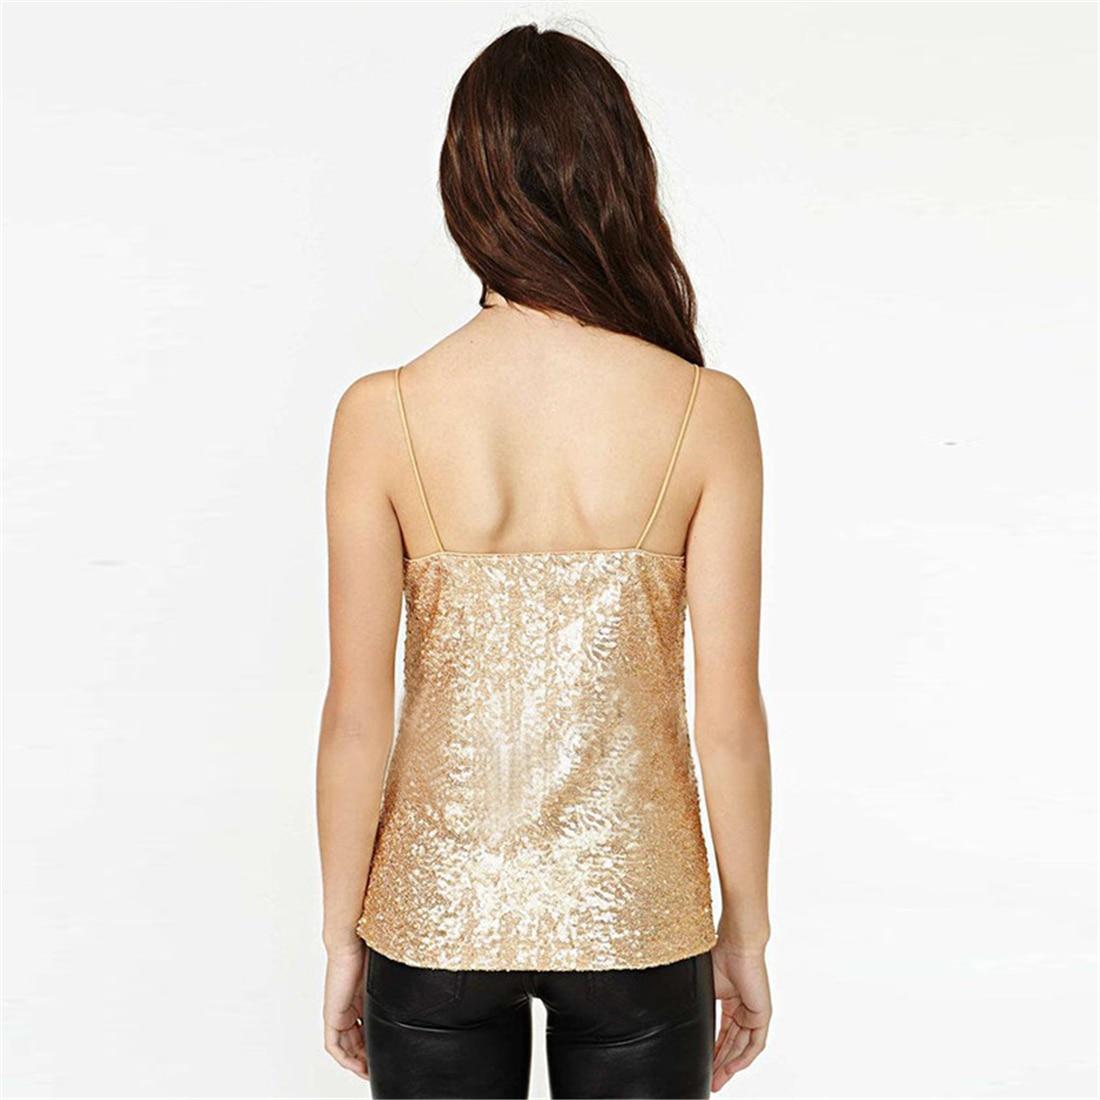 HTB1jimkRVXXXXaZaXXXq6xXFXXXN - Tank Top Summer Sexy Sleeveless Shirts Gold JKP089